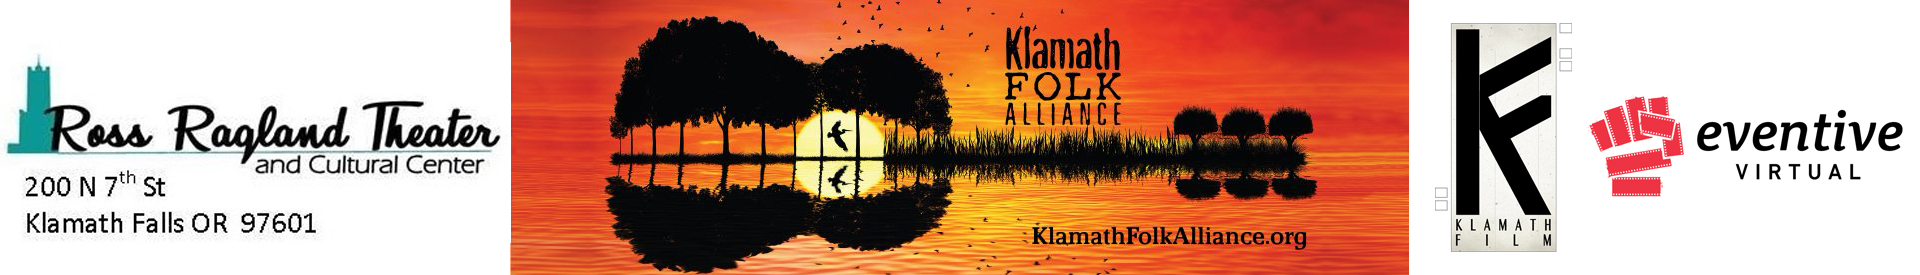 Klamath Folk Festival 2021